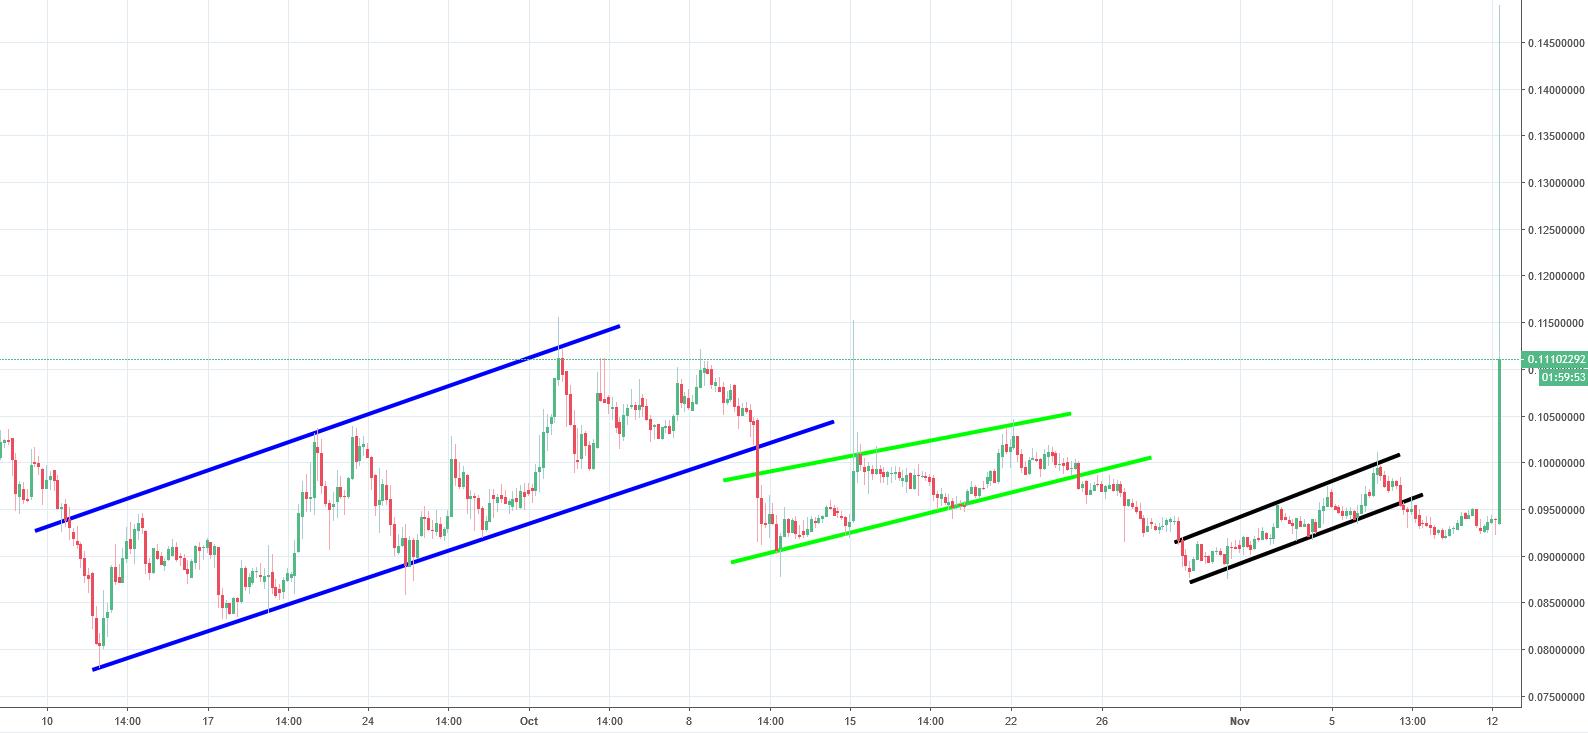 NEM Analysis - surprising turn of events!